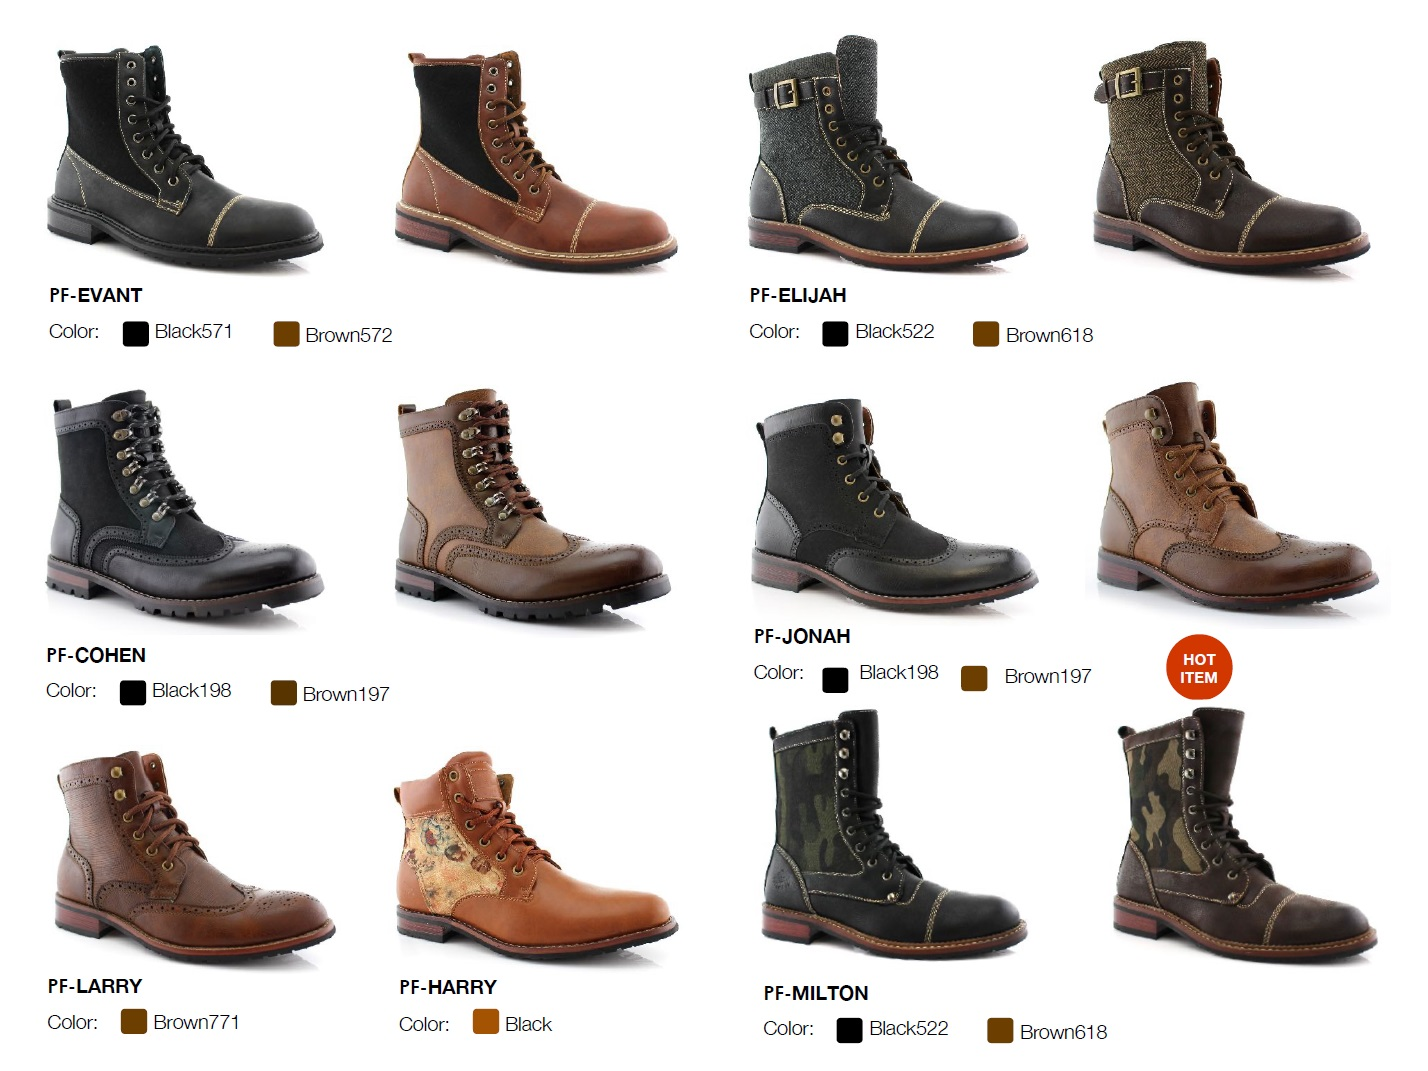 Nantlis Vol 43 Zapatos para Hombres Mayoreo Wholesale men shoes Catalogo Polar Fox Footwear_Page_08